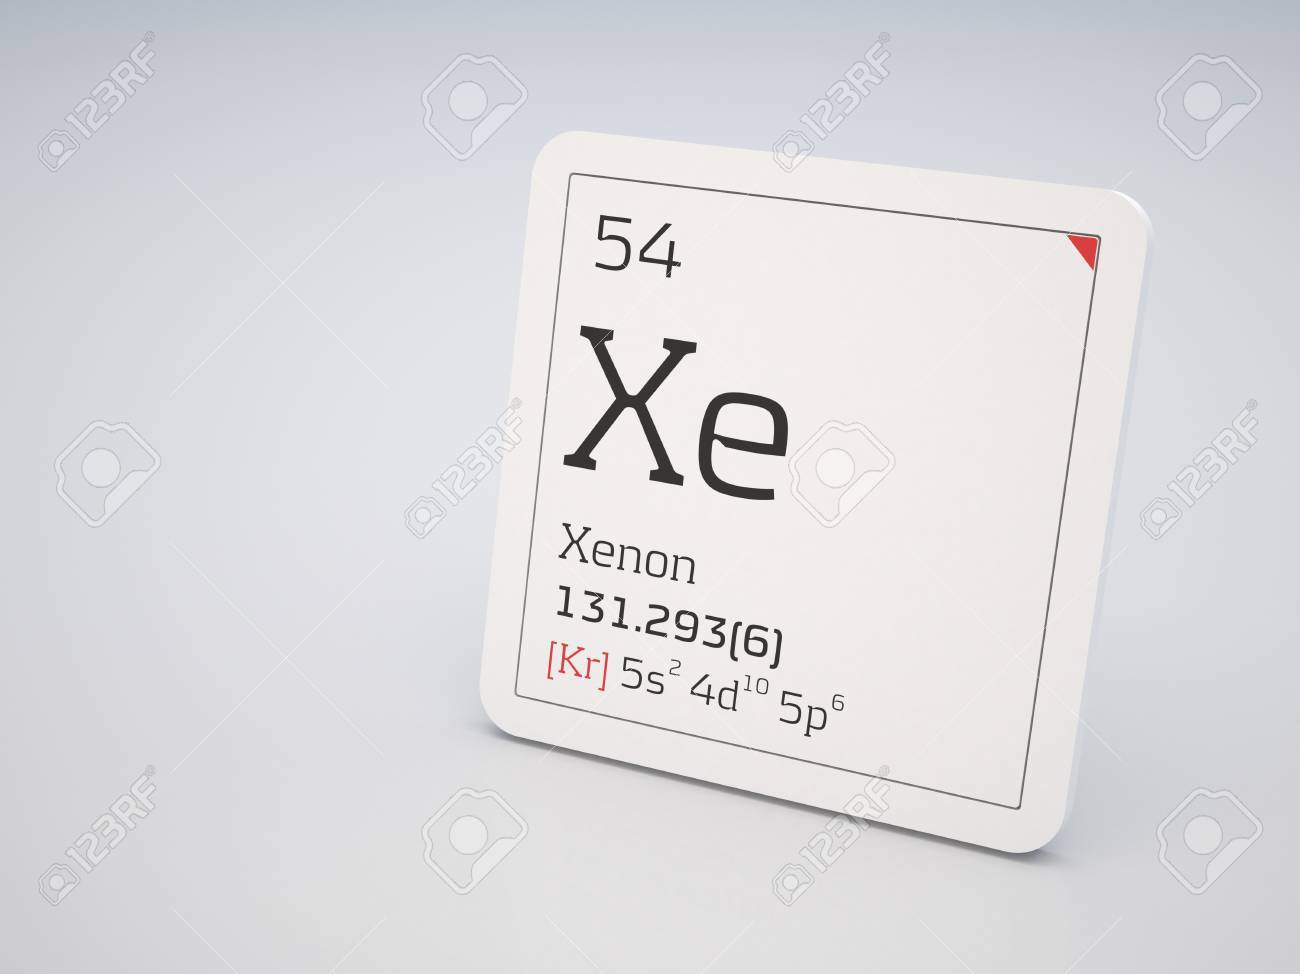 Xenn elemento de la tabla peridica fotos retratos imgenes y xenn elemento de la tabla peridica foto de archivo 11959093 urtaz Images